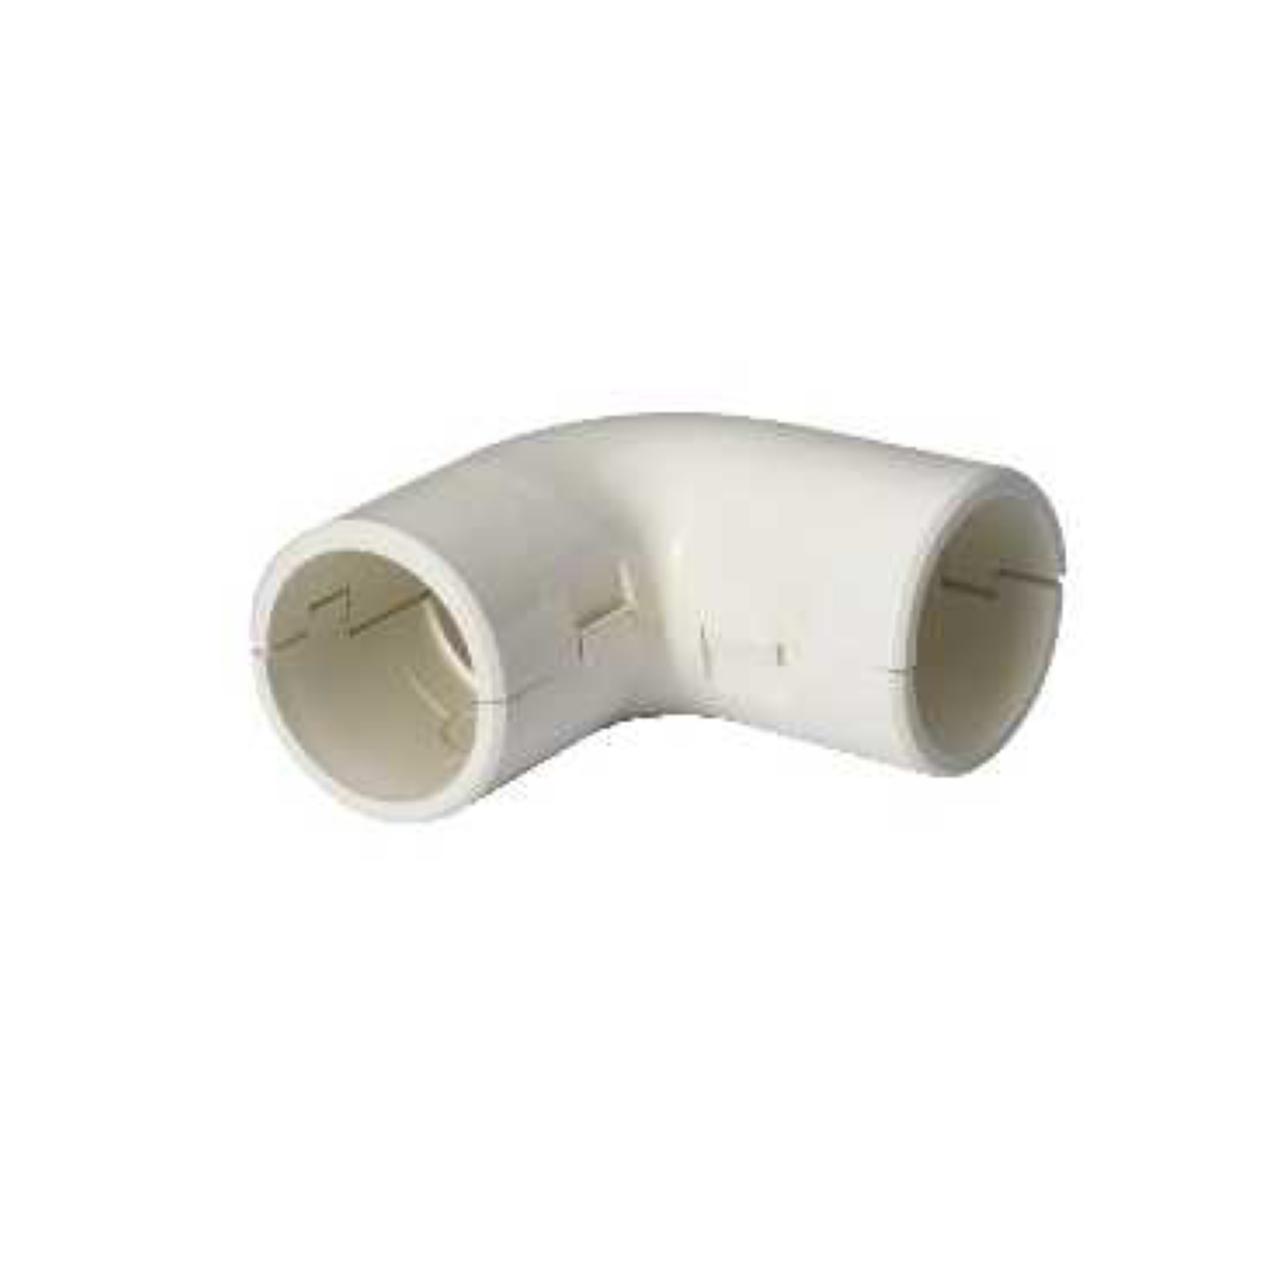 coude querre pour tube irl 3321 diam tre 25 mm blanc. Black Bedroom Furniture Sets. Home Design Ideas